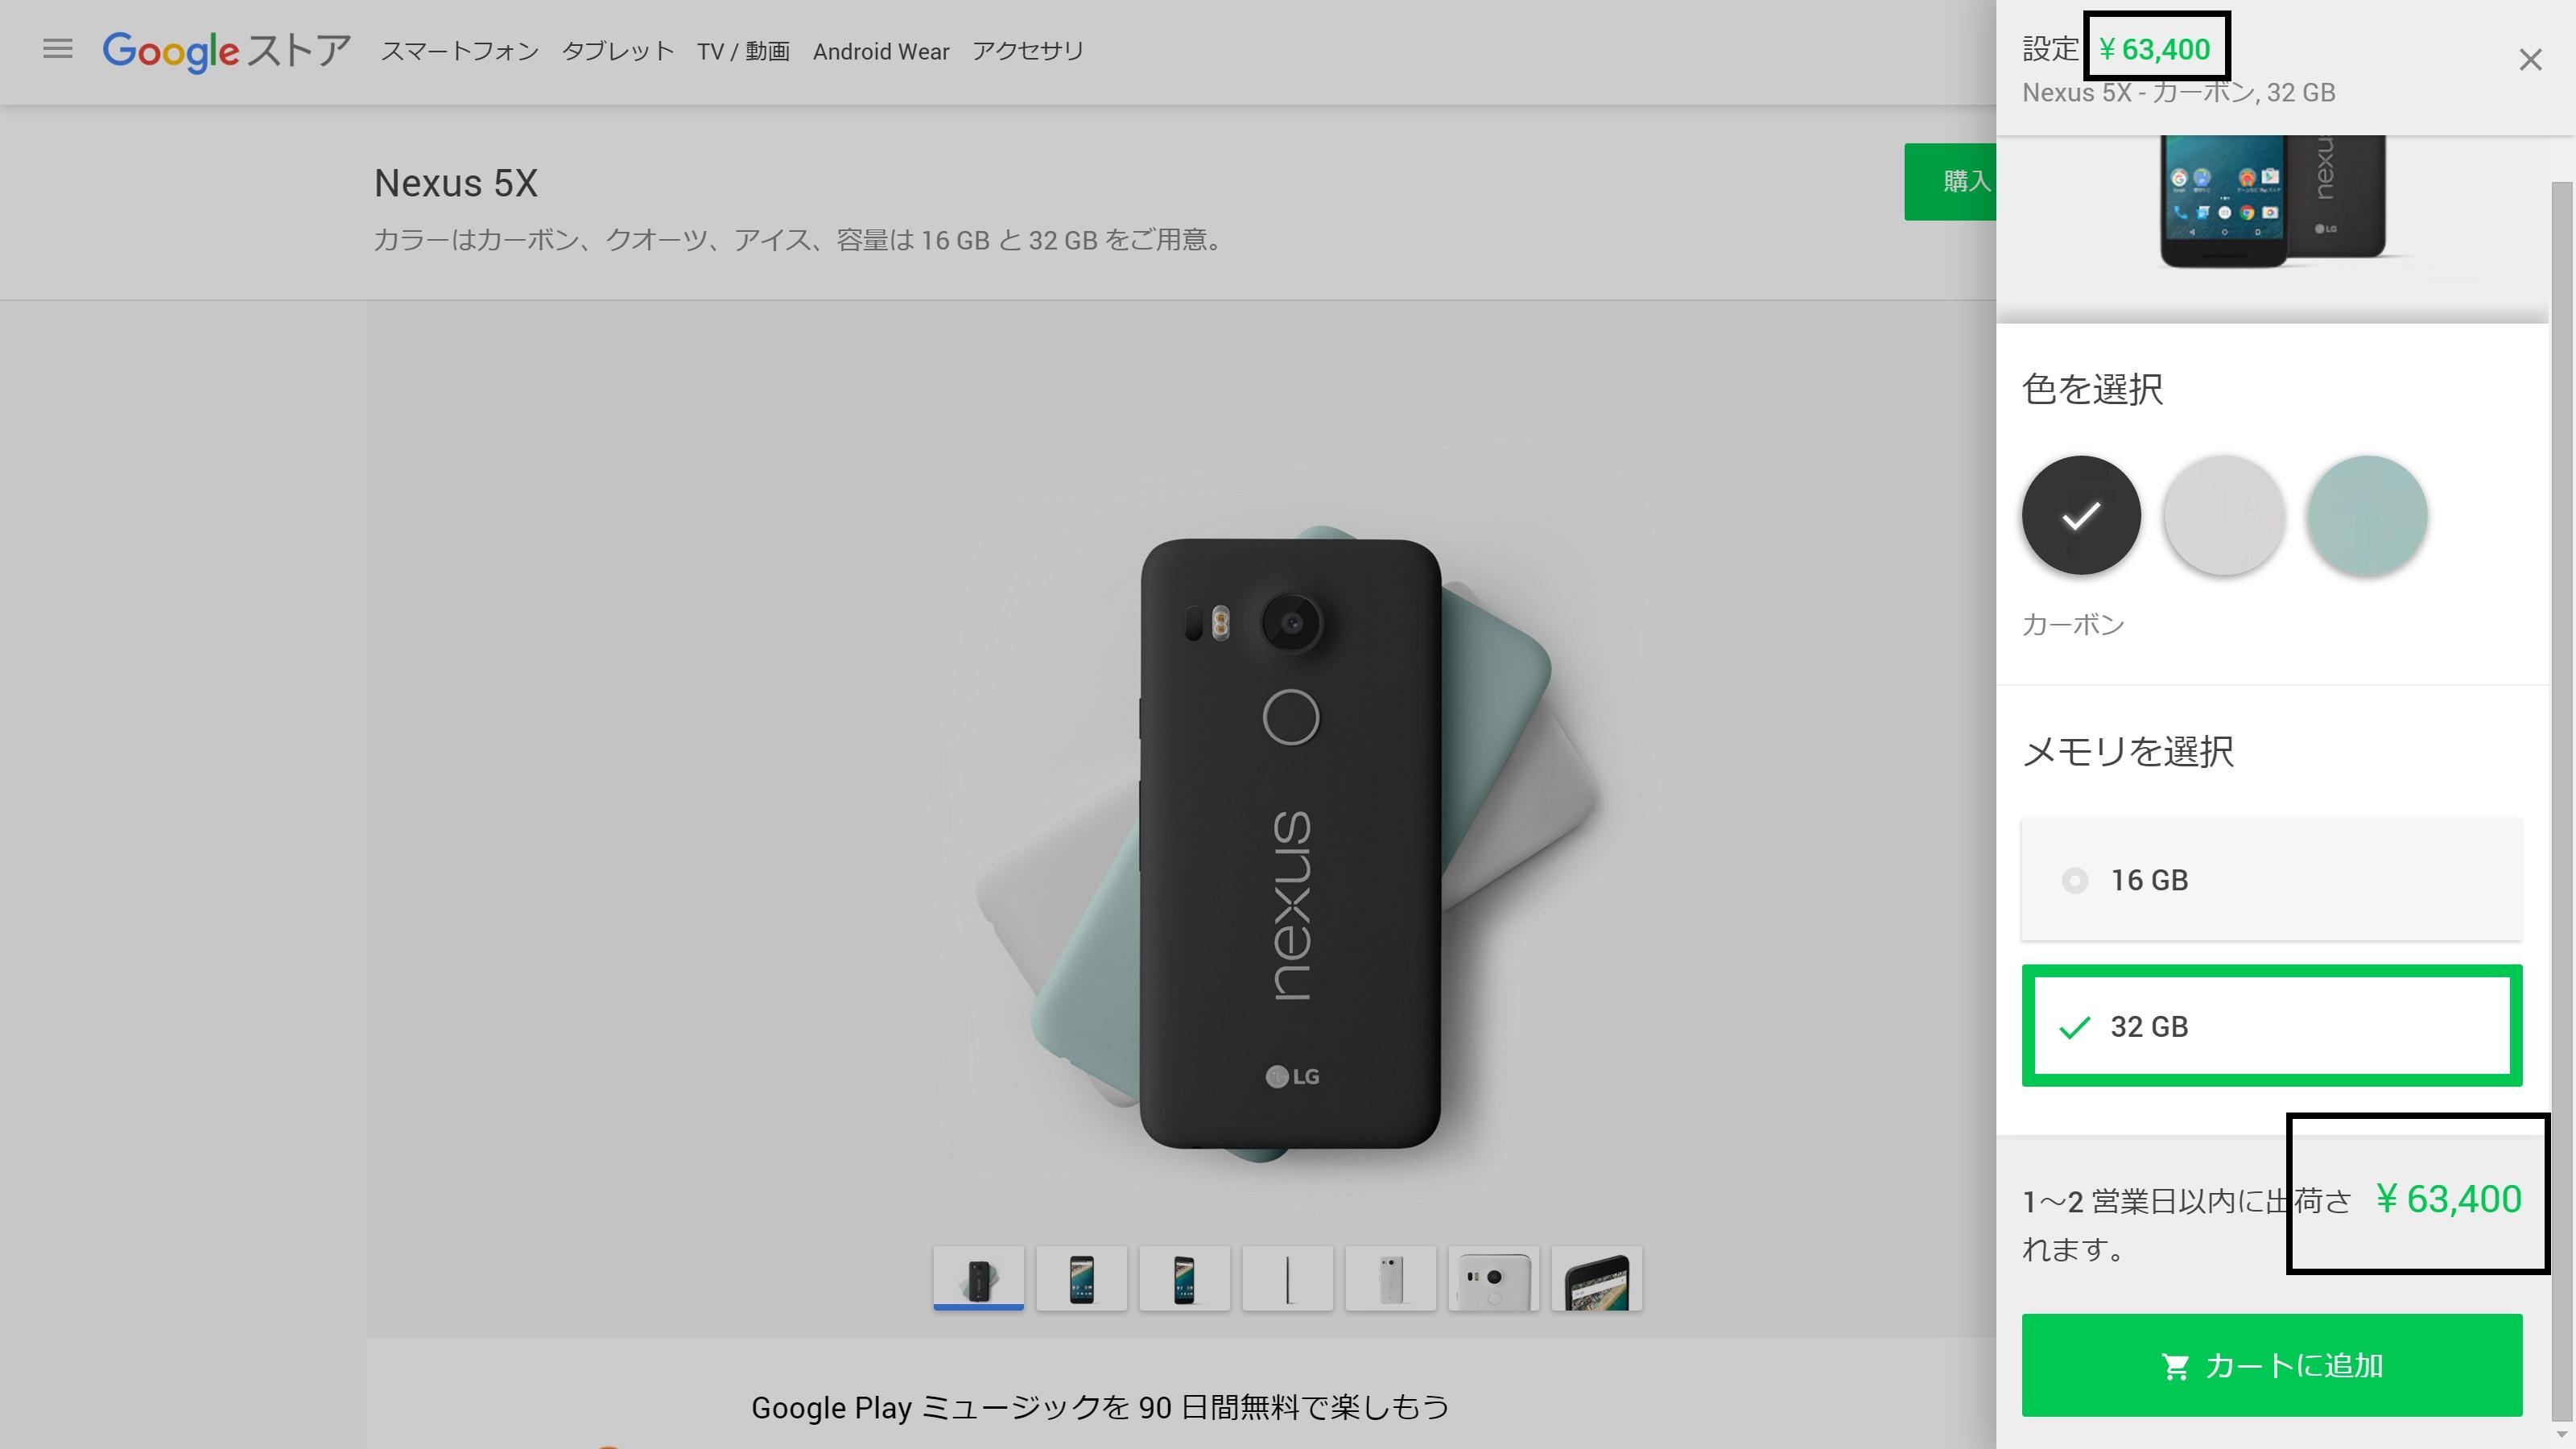 Nexus 5X Google Store Japan